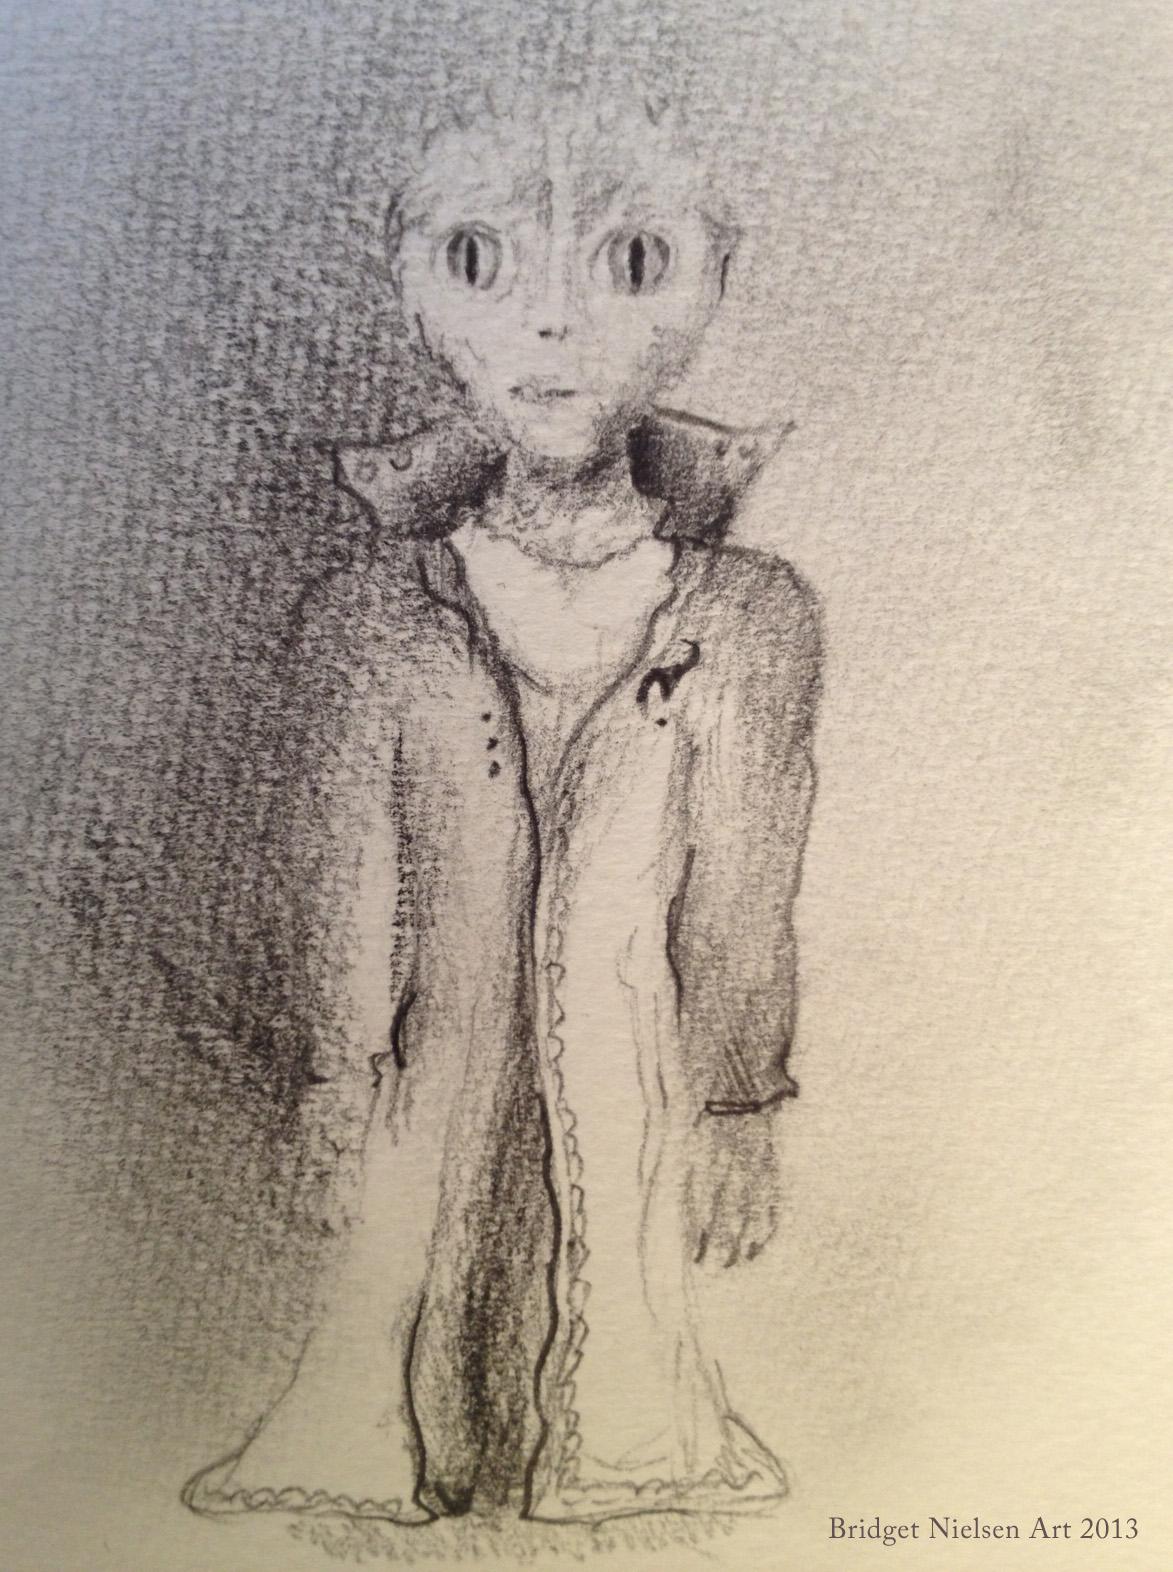 Drawing of a reptilian zeta alien